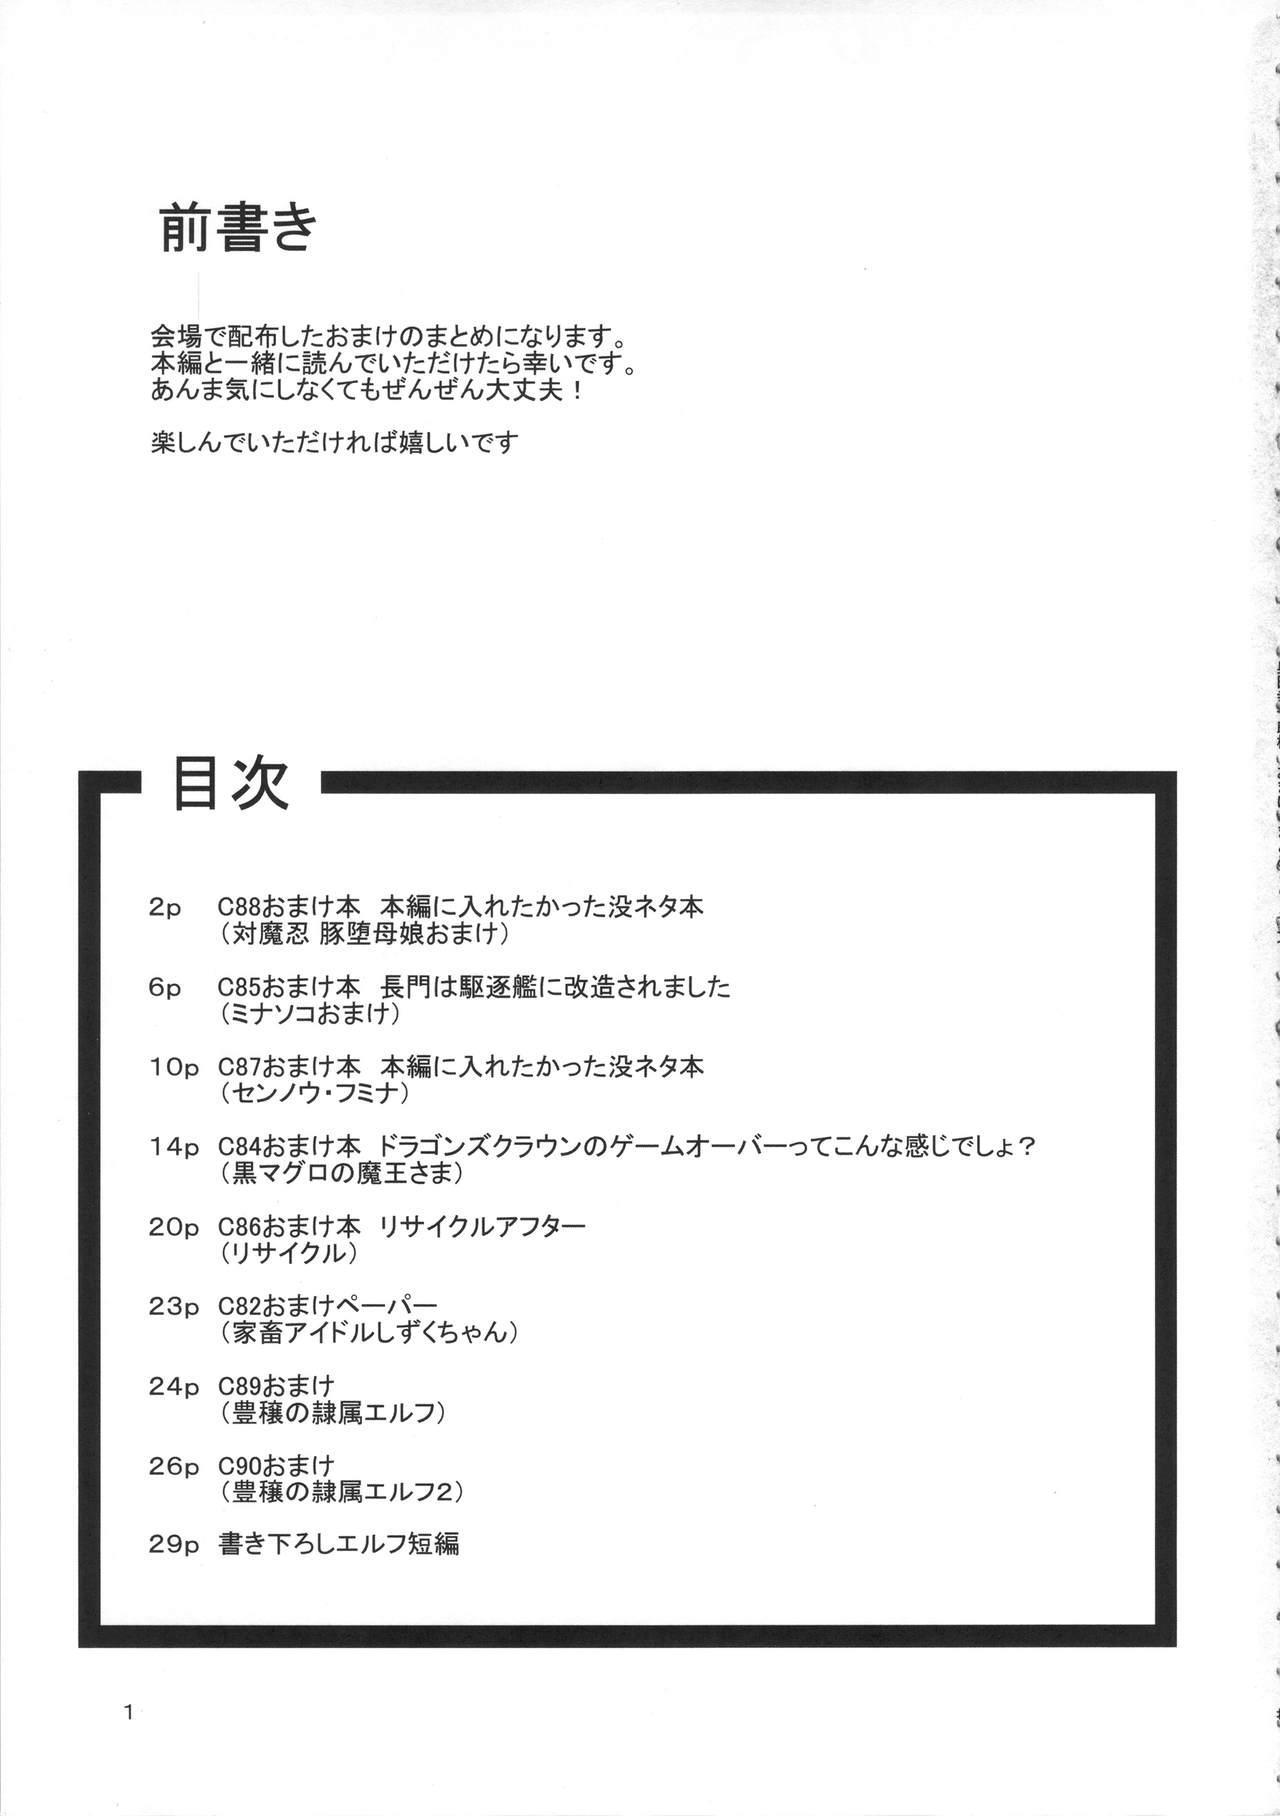 Omake no Matome + α 1